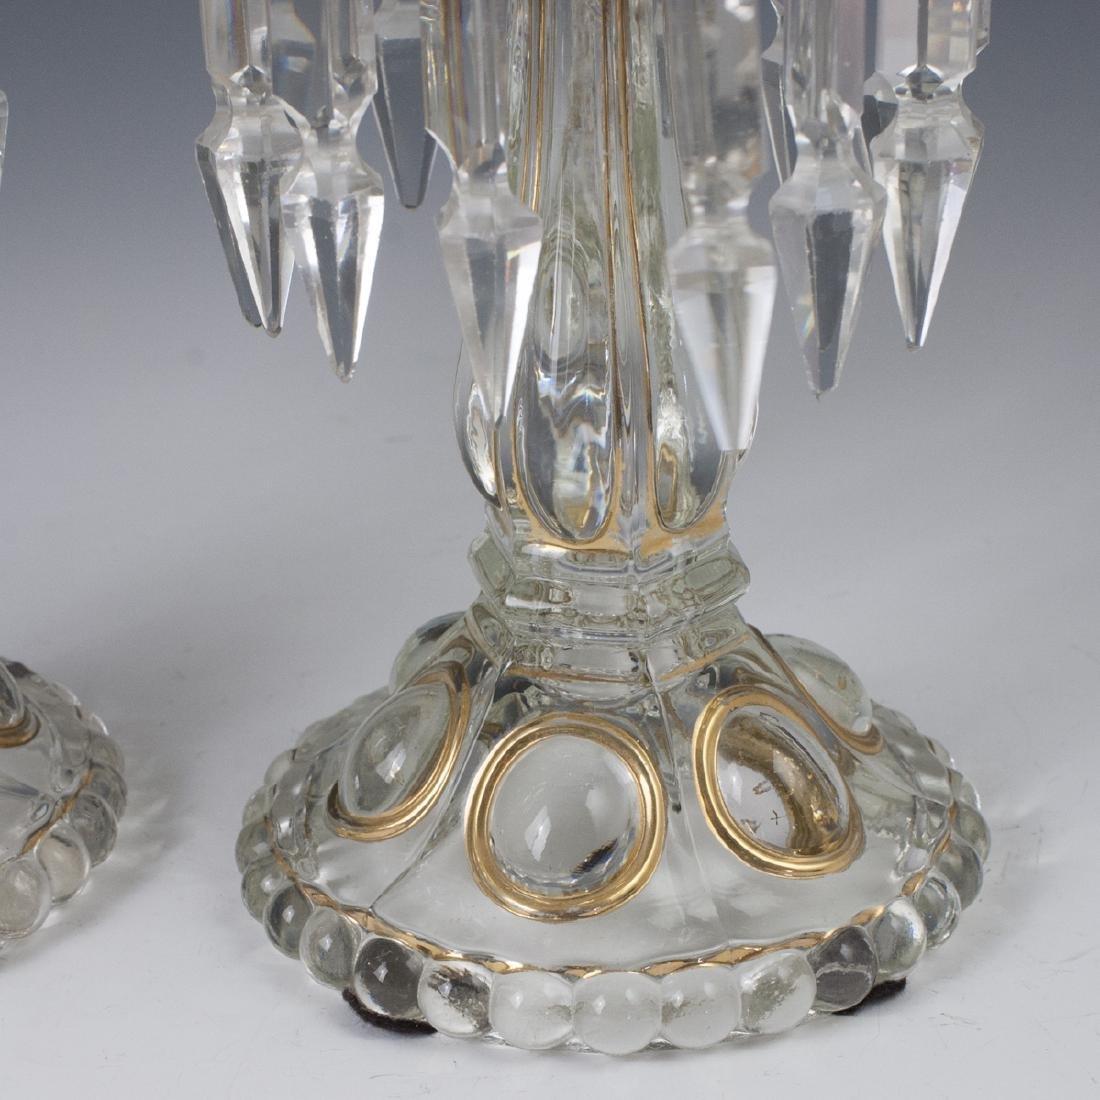 Antique Crystal Candlesticks - 4